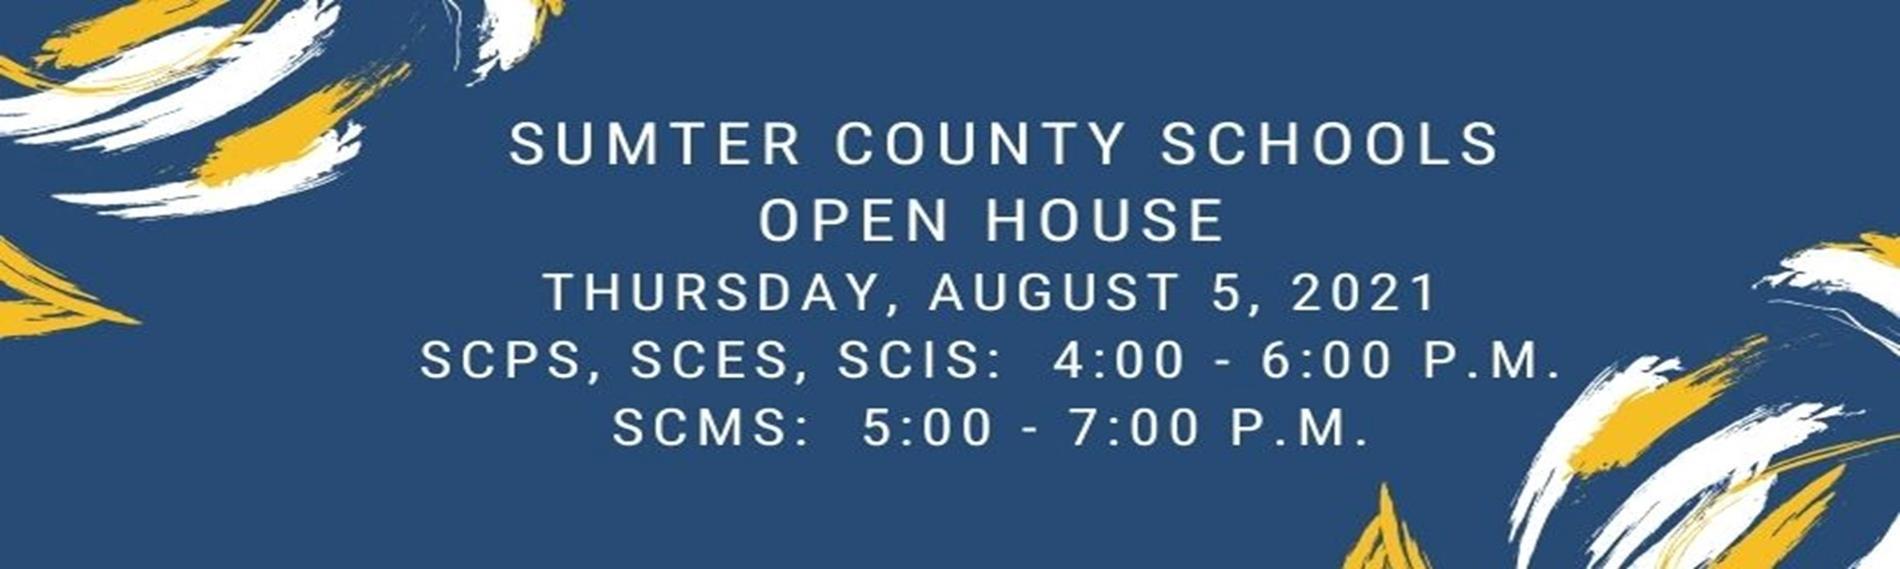 SCS Open House